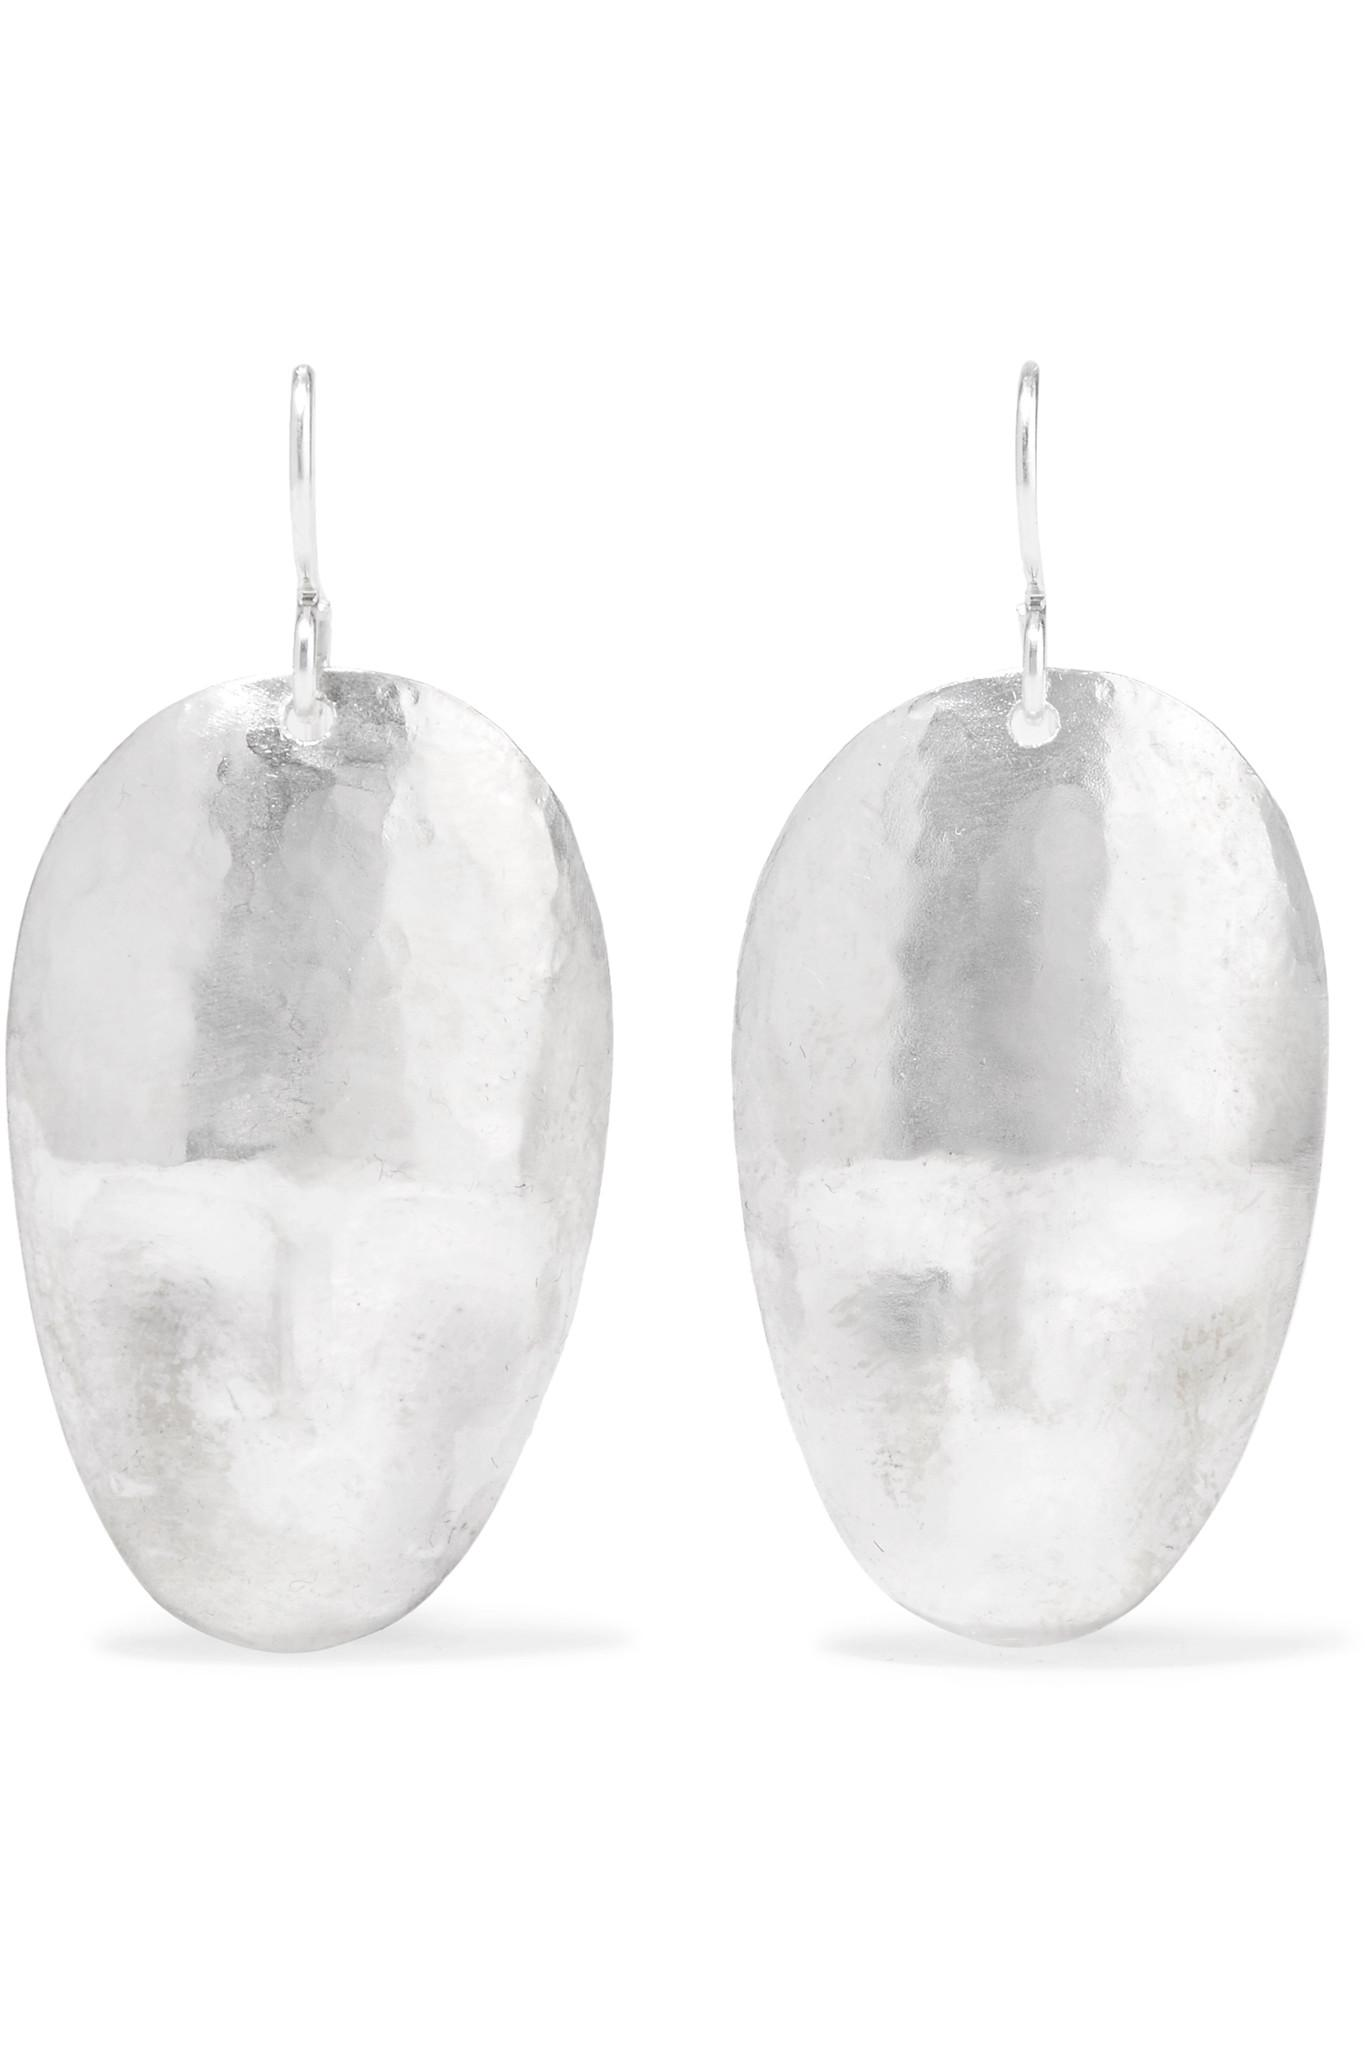 Large Face Silver And Enamel Earrings - Blue Simon Miller 5qPDzT5